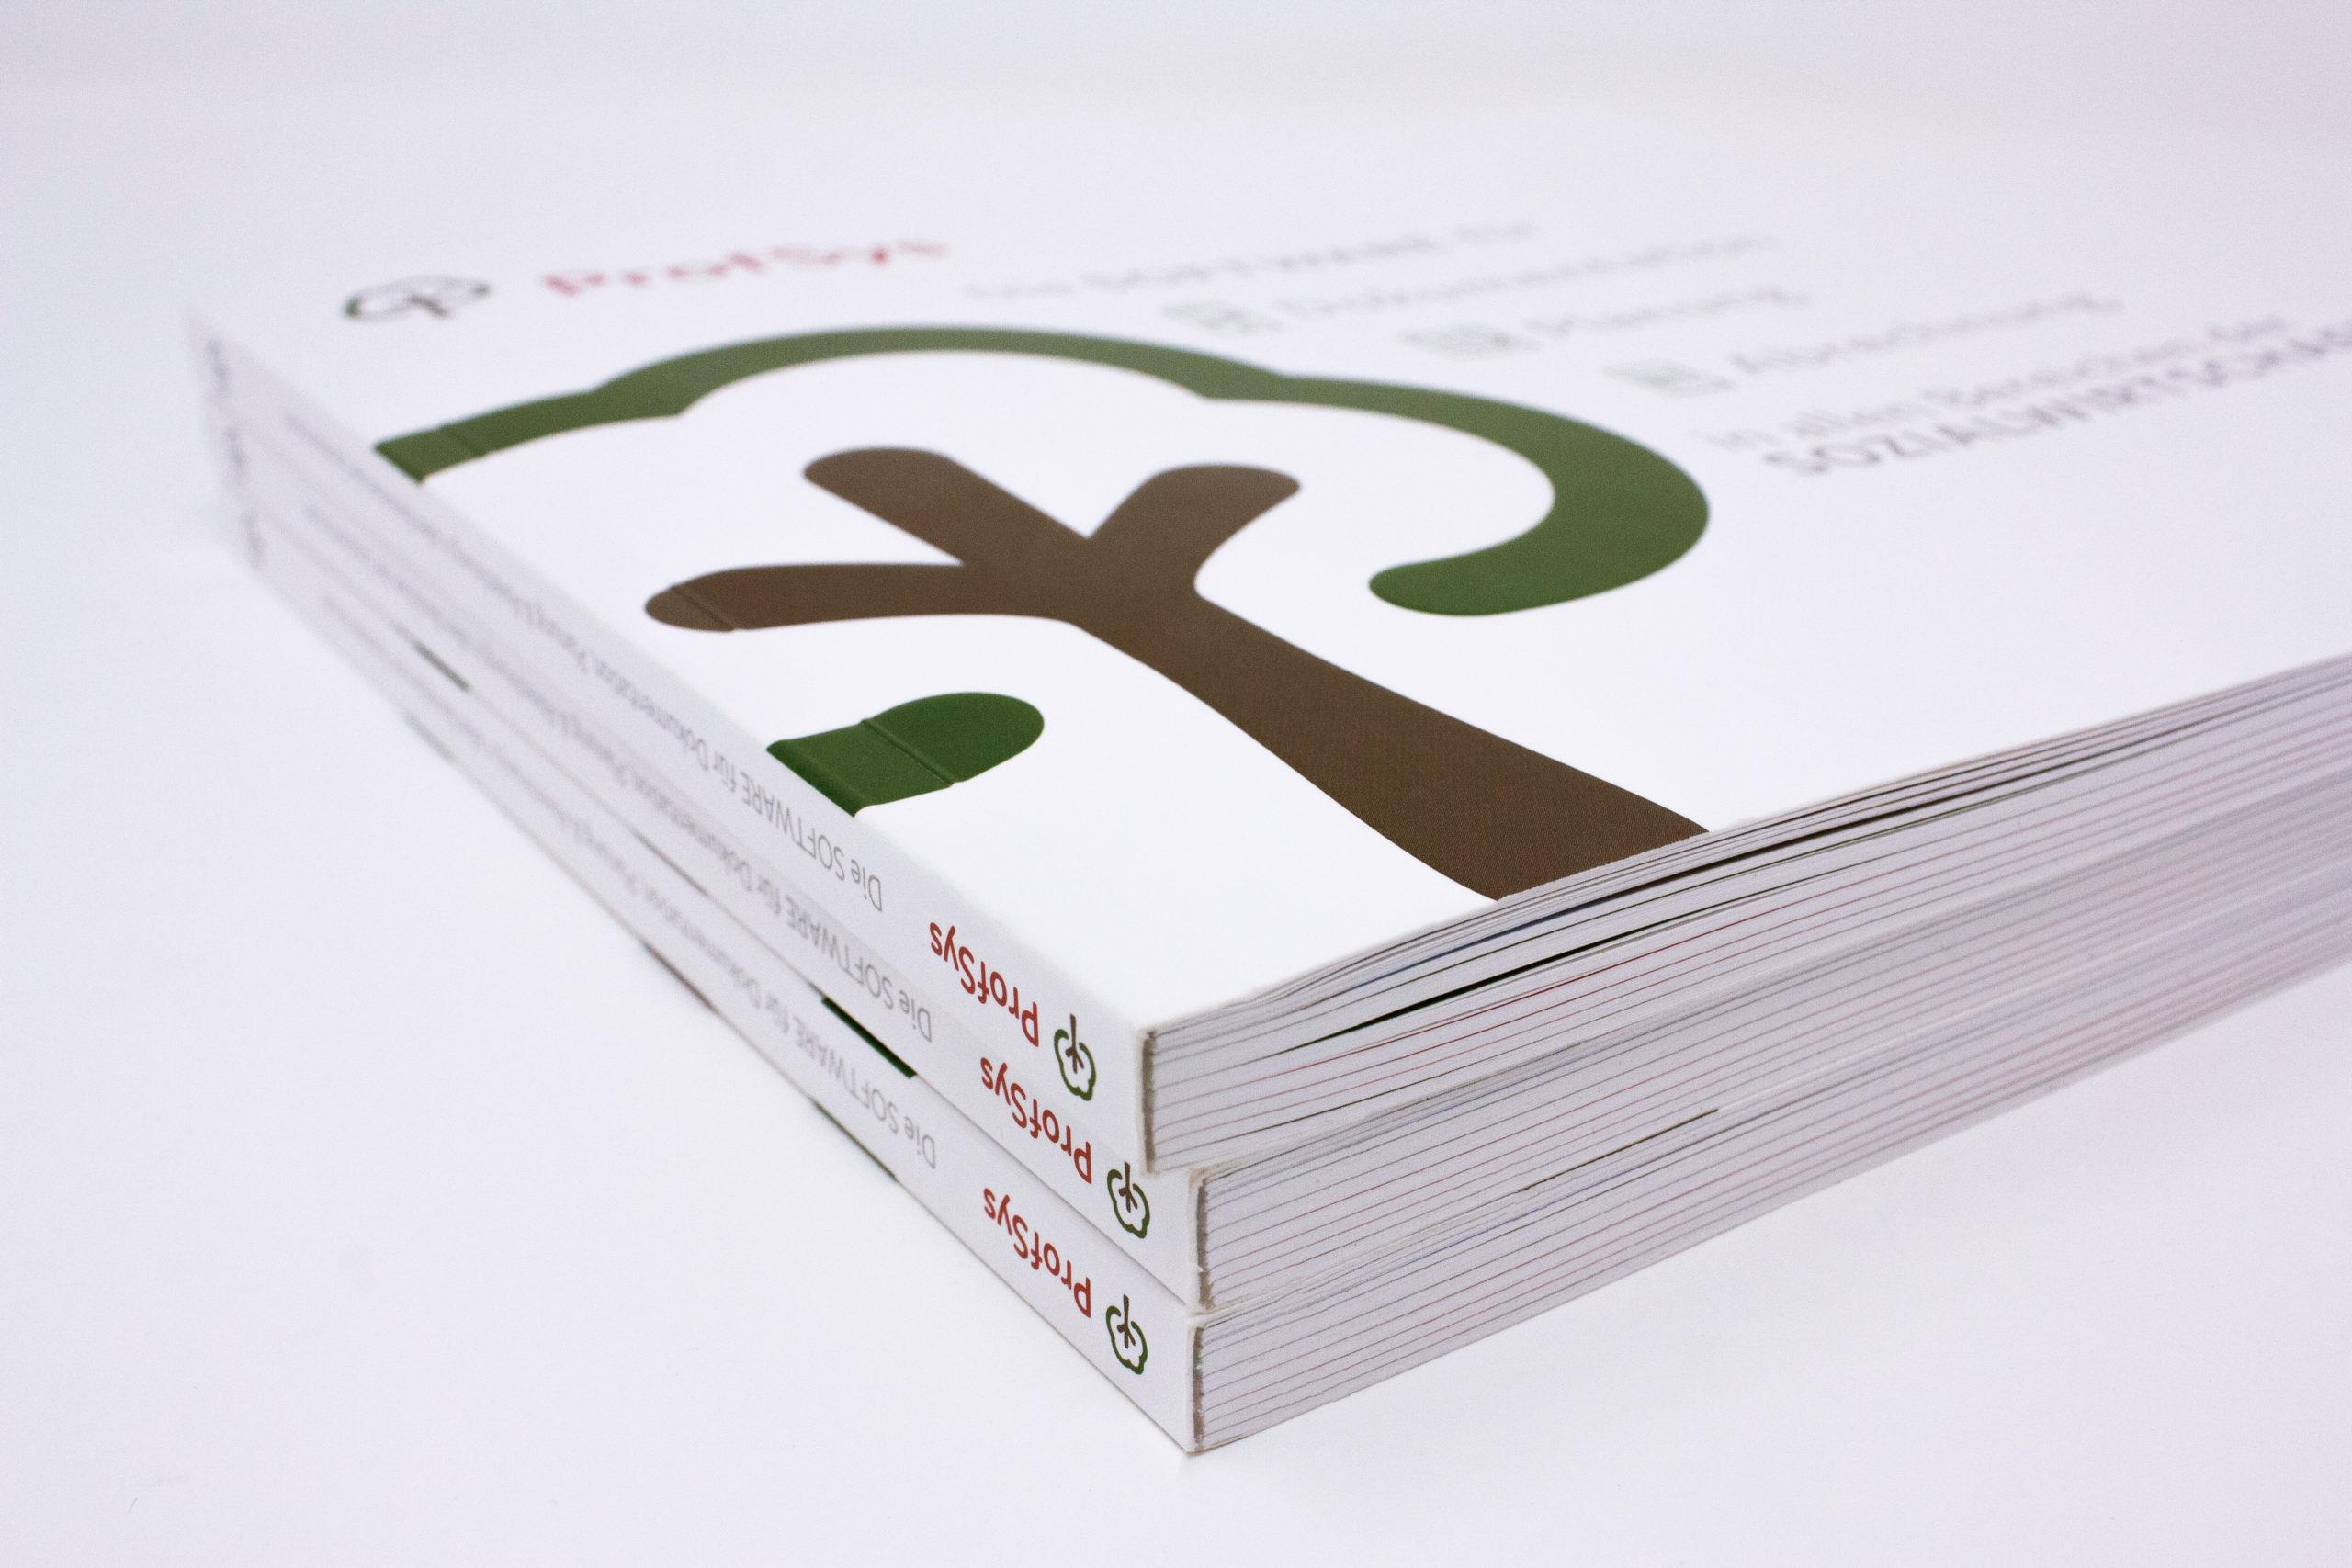 FORMLOS-ProfSys-Print-Broschüre-Corporate-Design-3